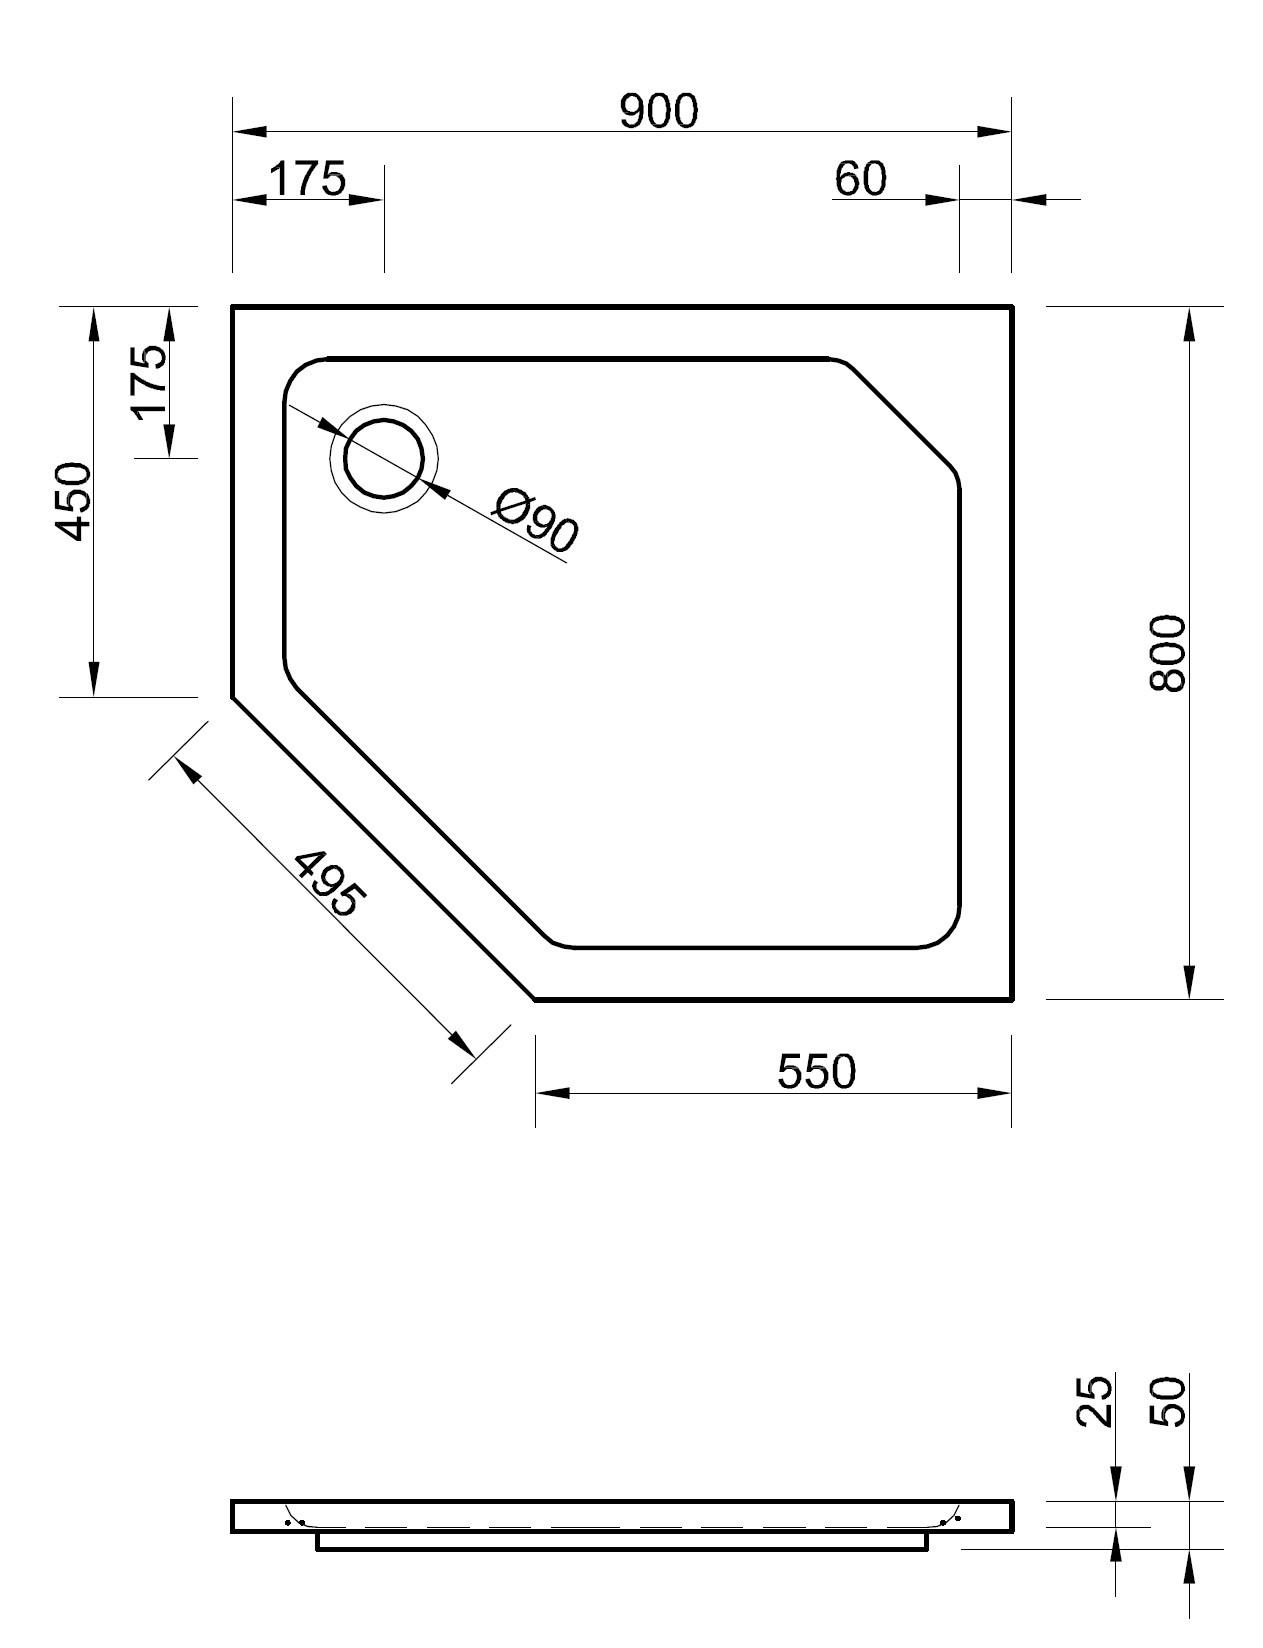 duschwanne f nfeck 90 x 80 x 2 5 cm duschwanne duschtasse f nfeck f nfeckduschwanne 90x90. Black Bedroom Furniture Sets. Home Design Ideas